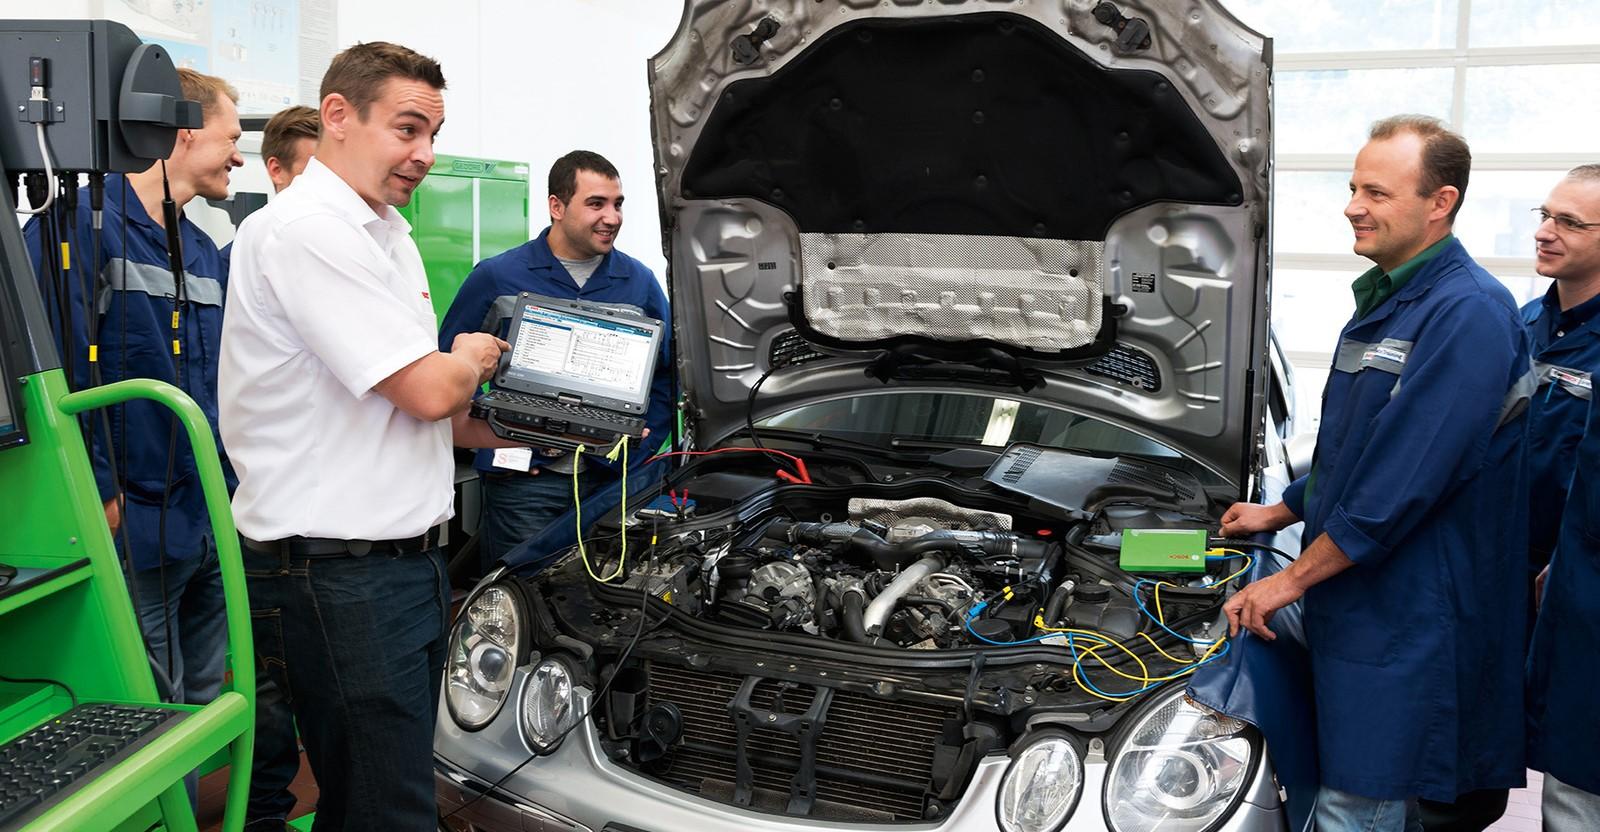 Automotive Aftermarket Business Automotive Aftermarket Industry Trends